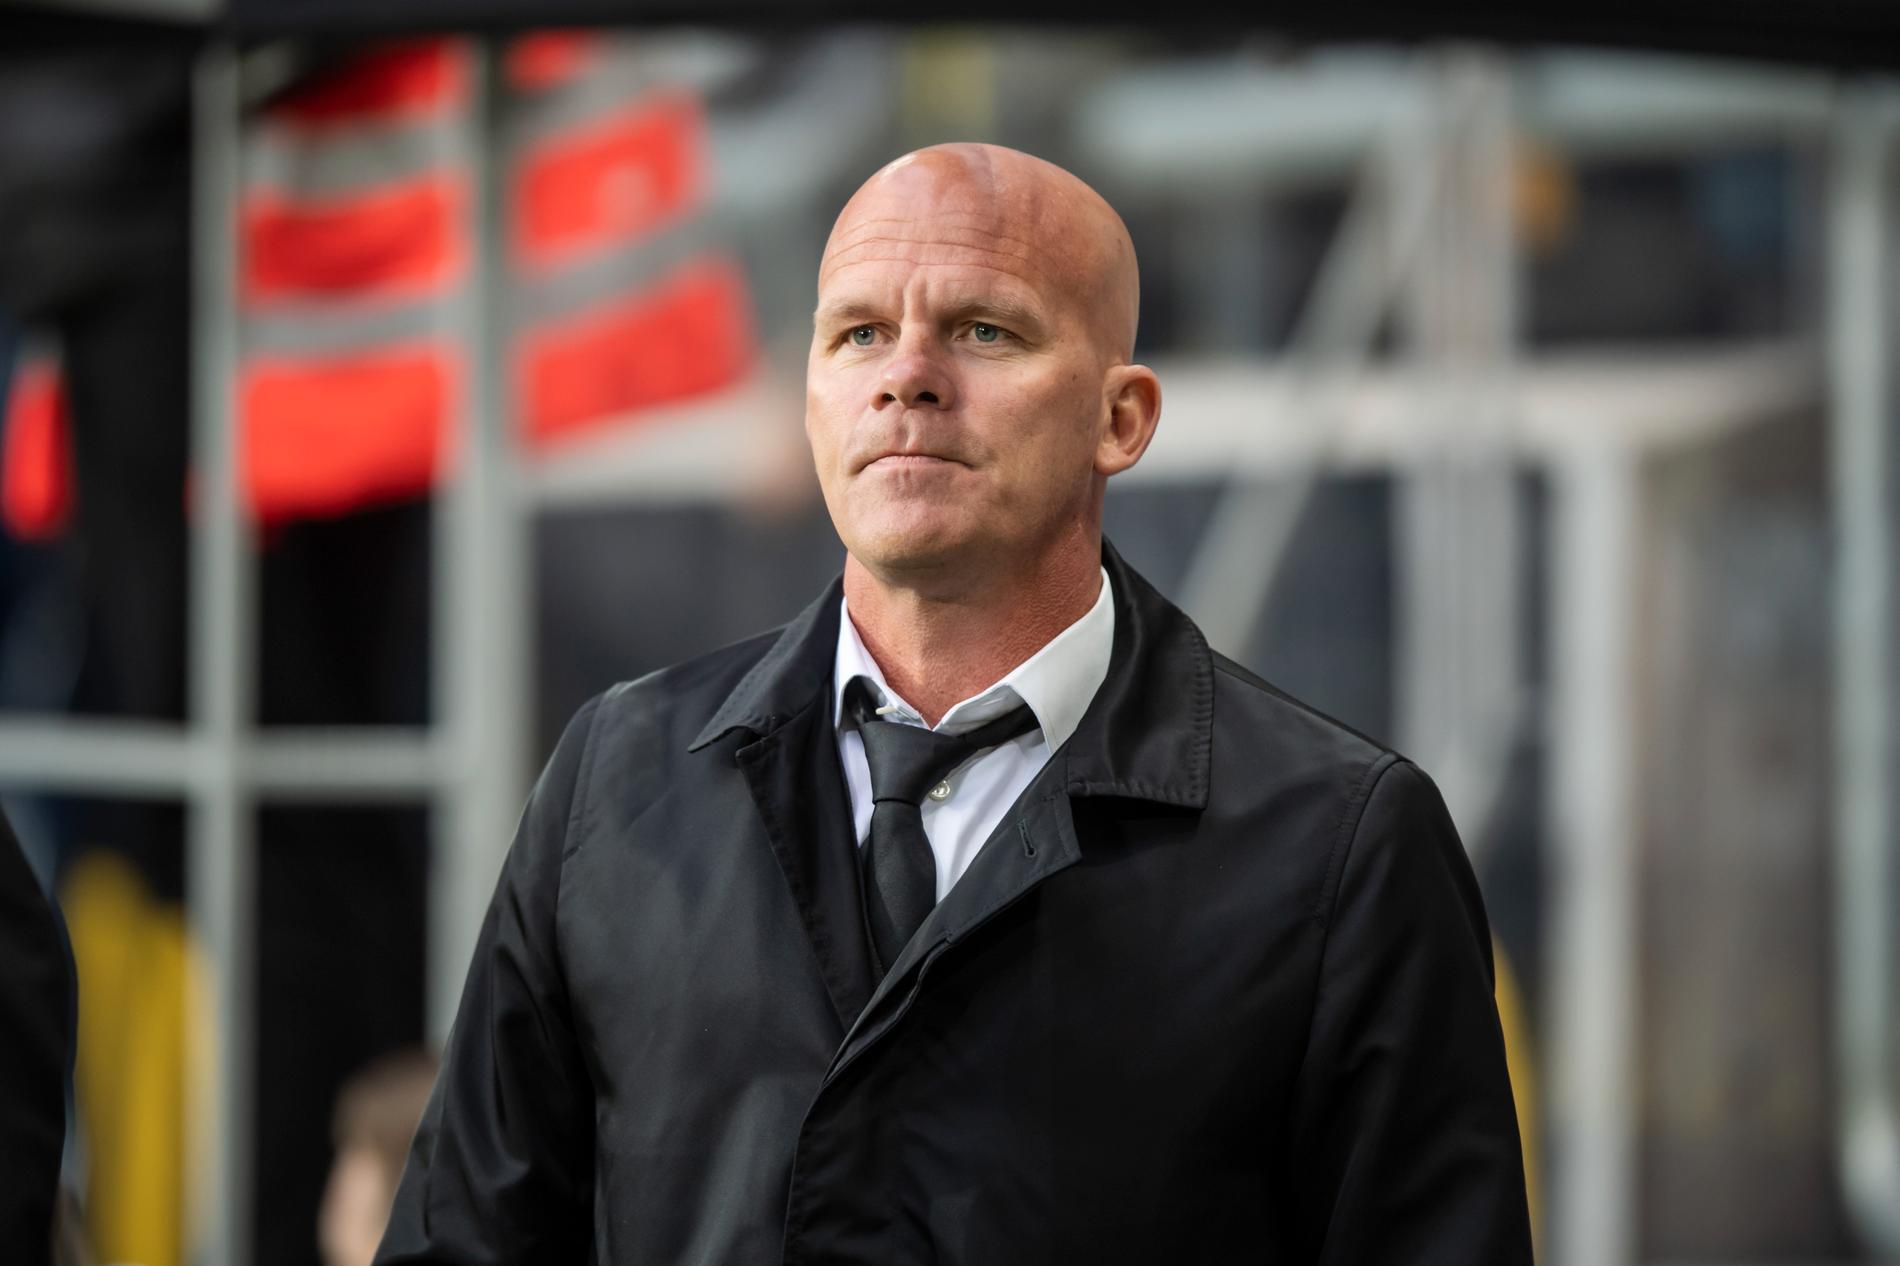 Sef-ordföranden Jens T Andersson